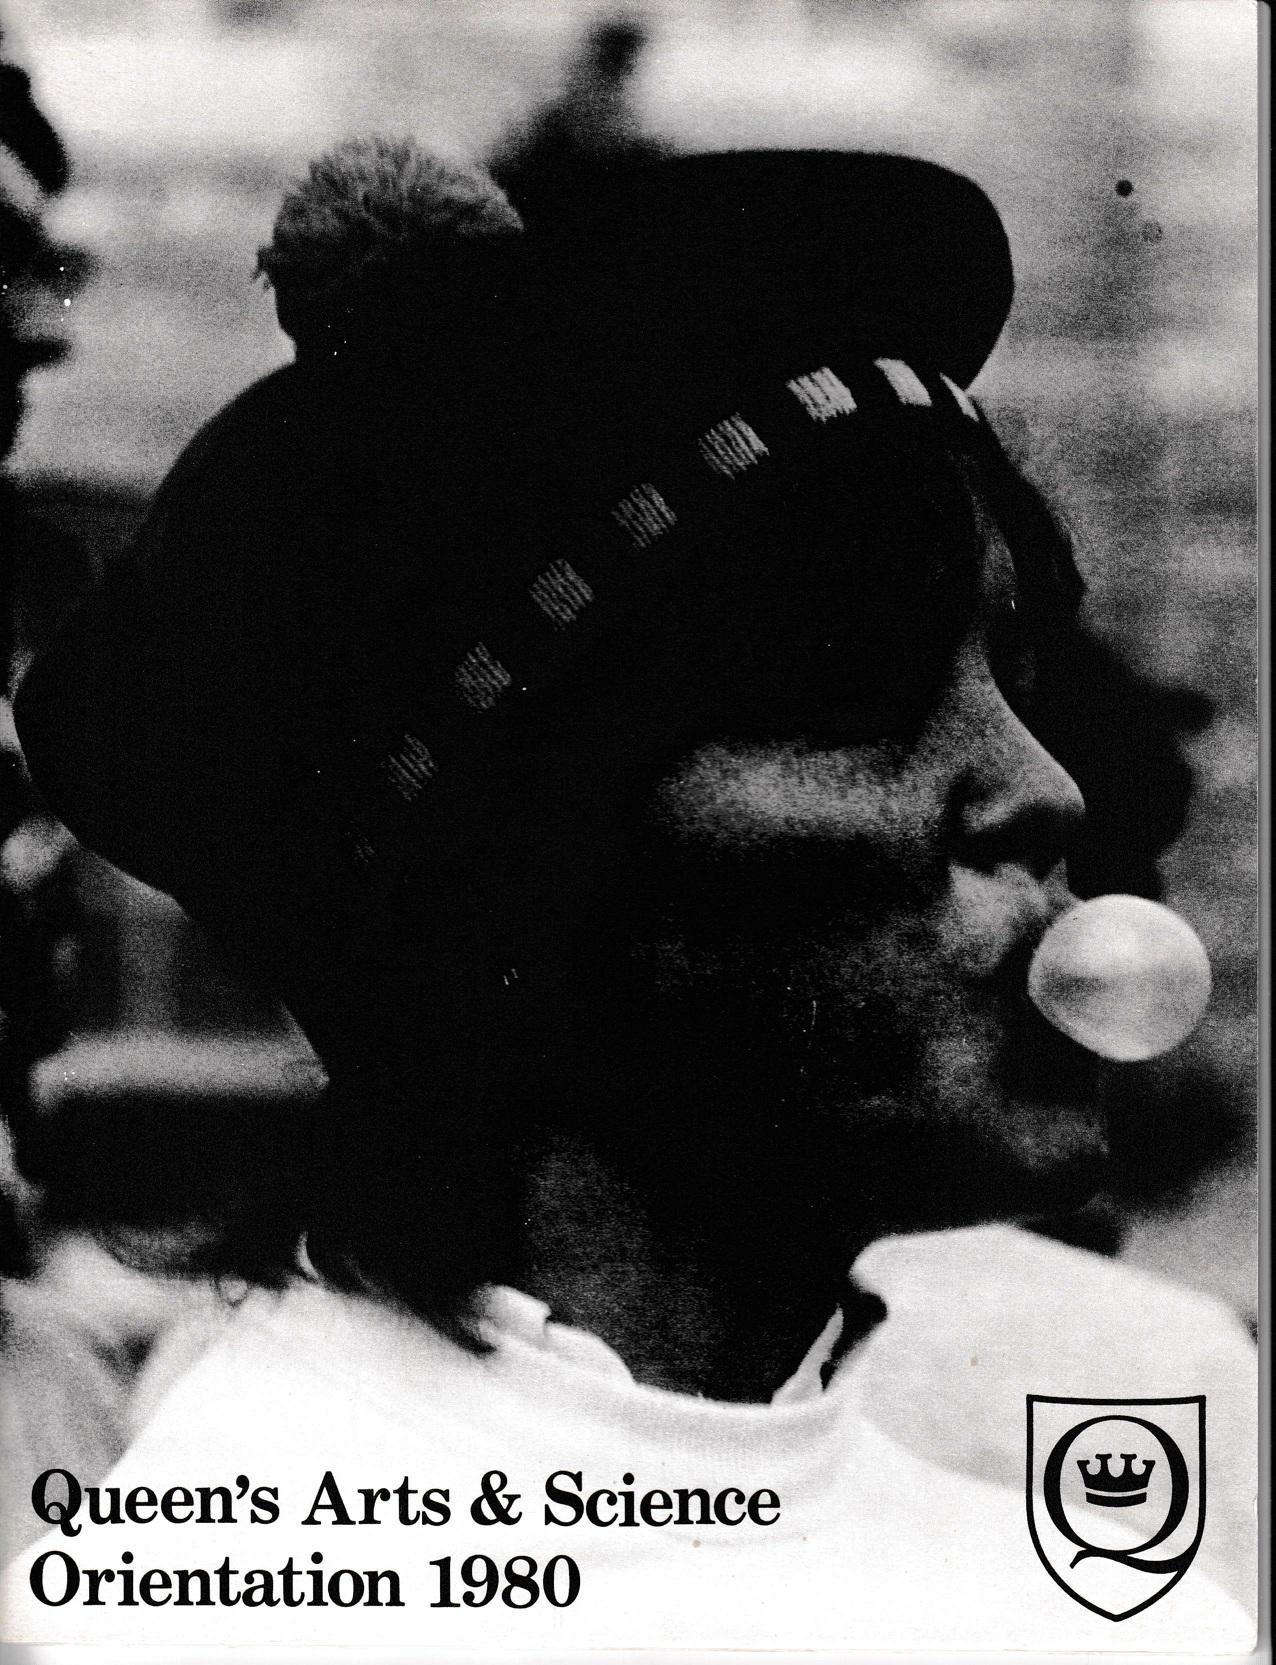 orientation hanbook cover 1980.jpg